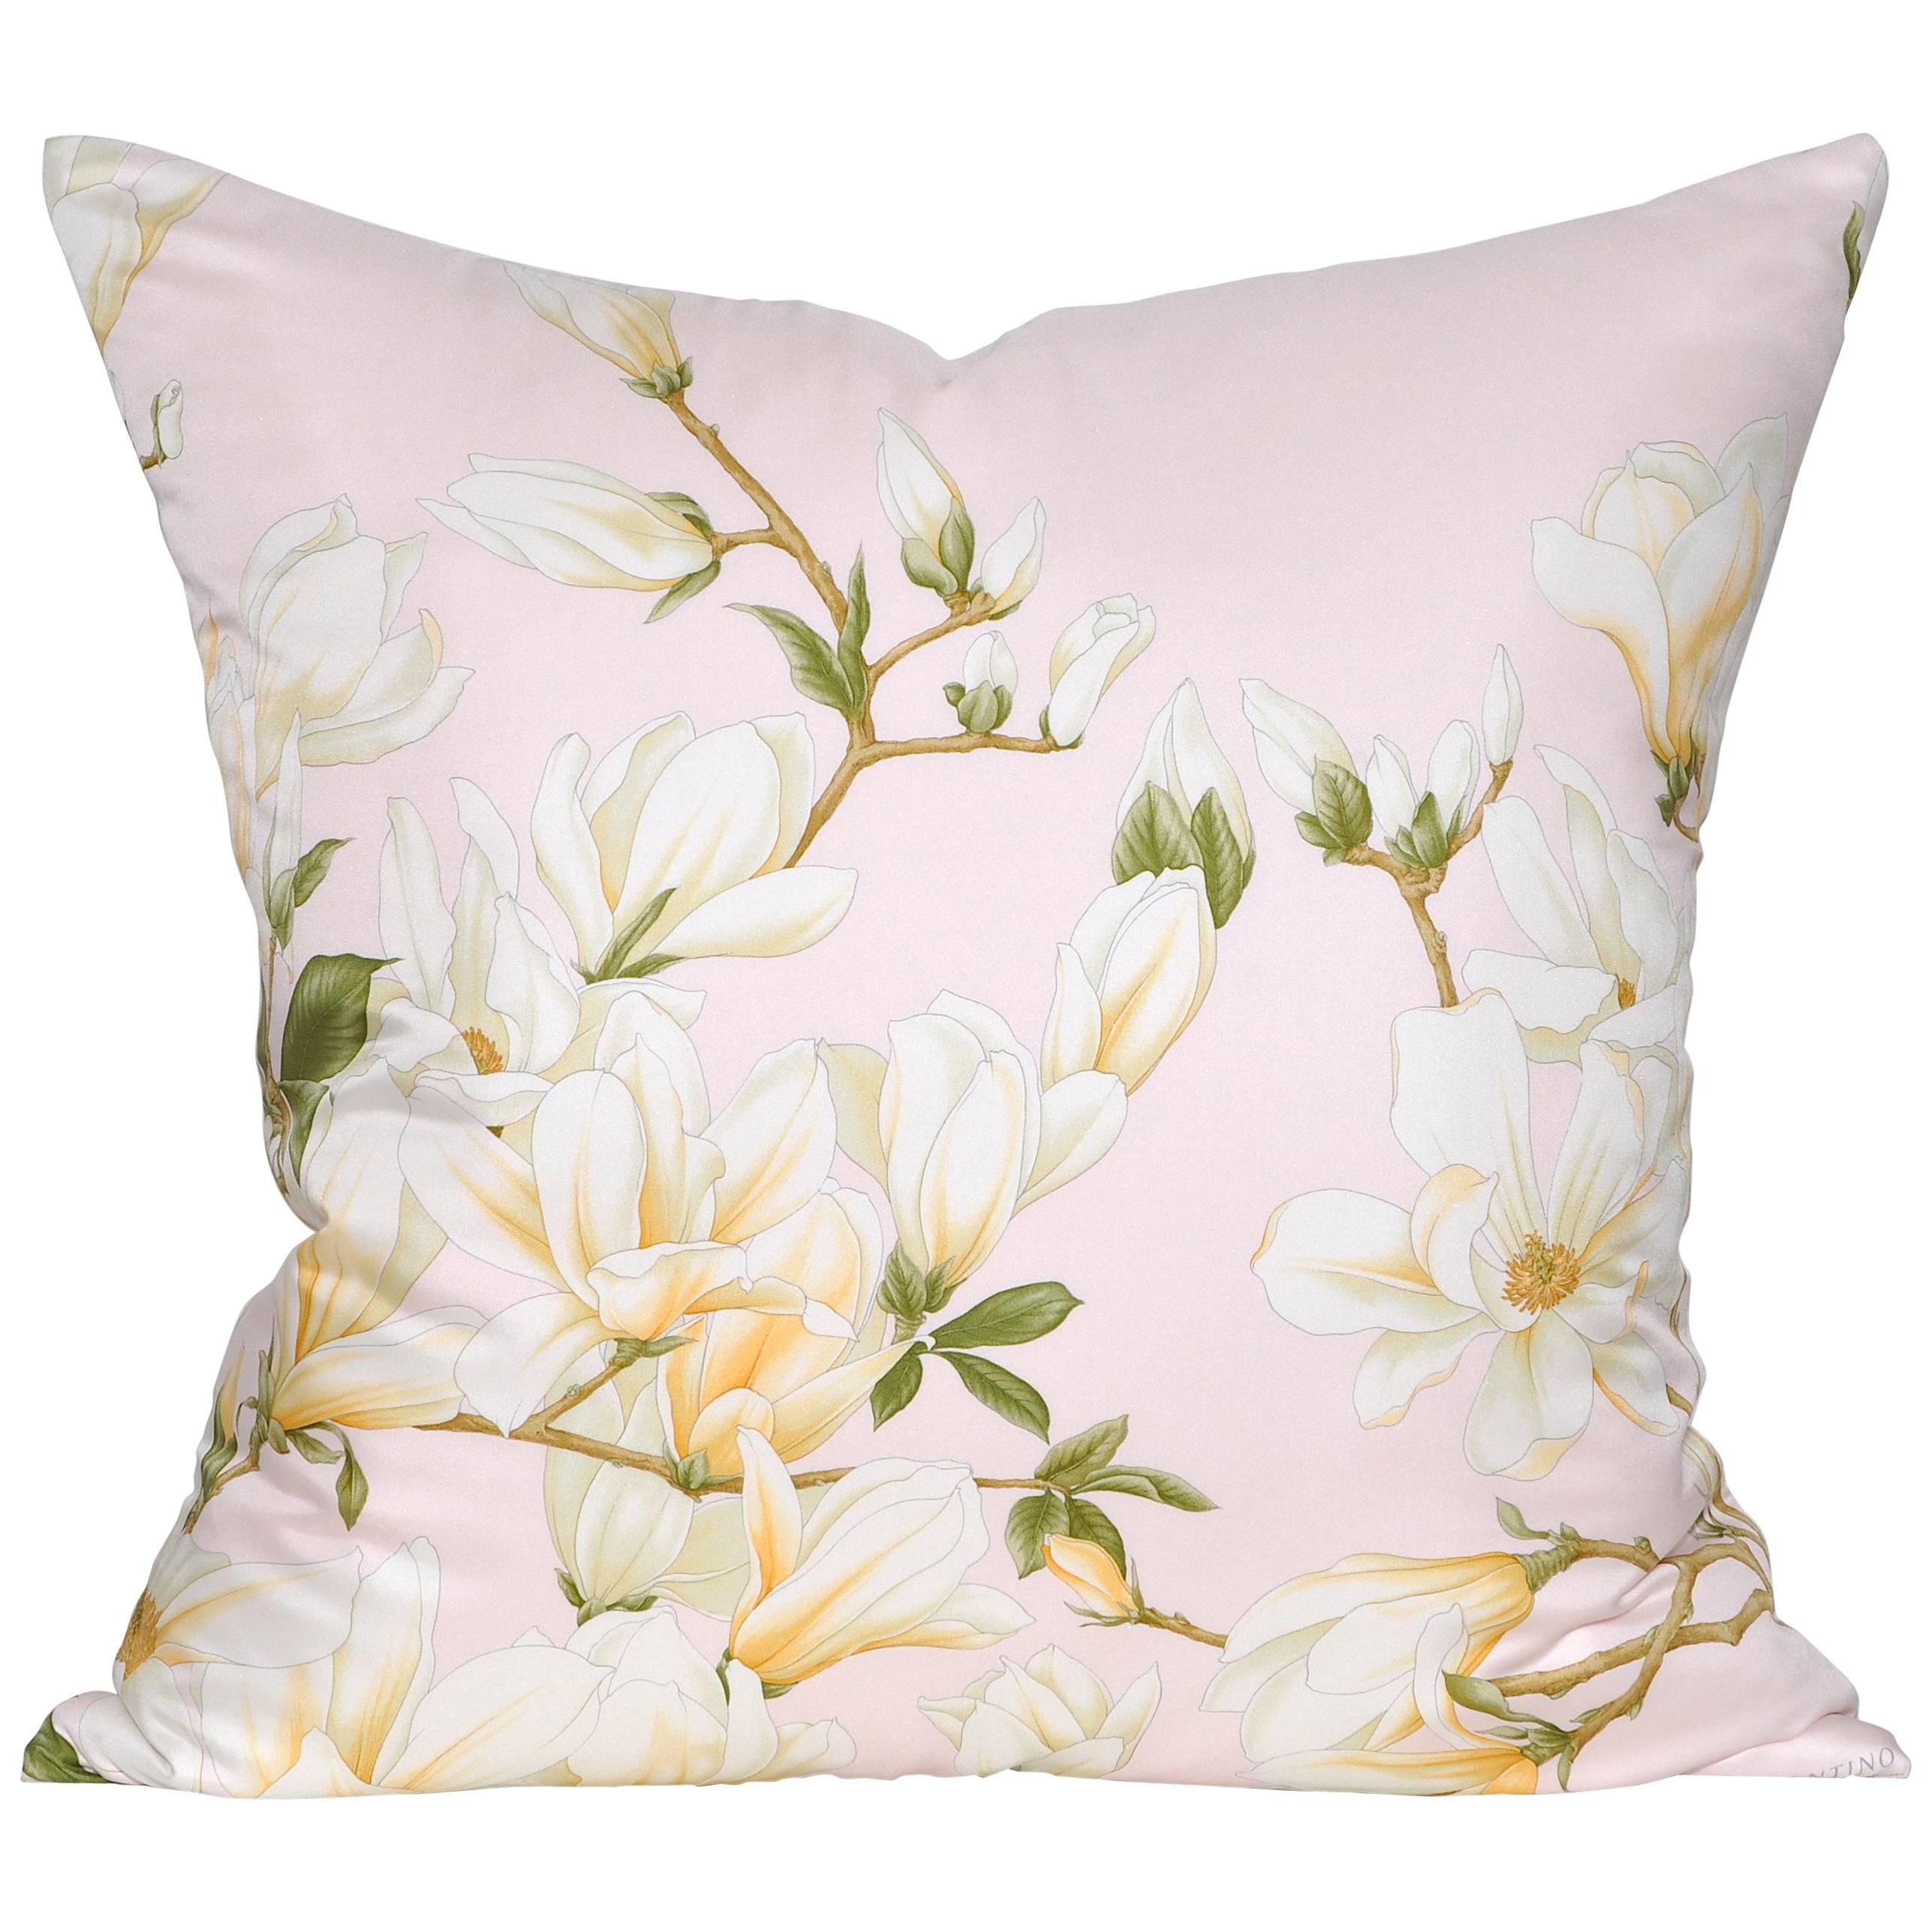 throw dp blush pinzon pleat com pale cover set home queen pink amazon duvet pinch pillow kitchen pillows full